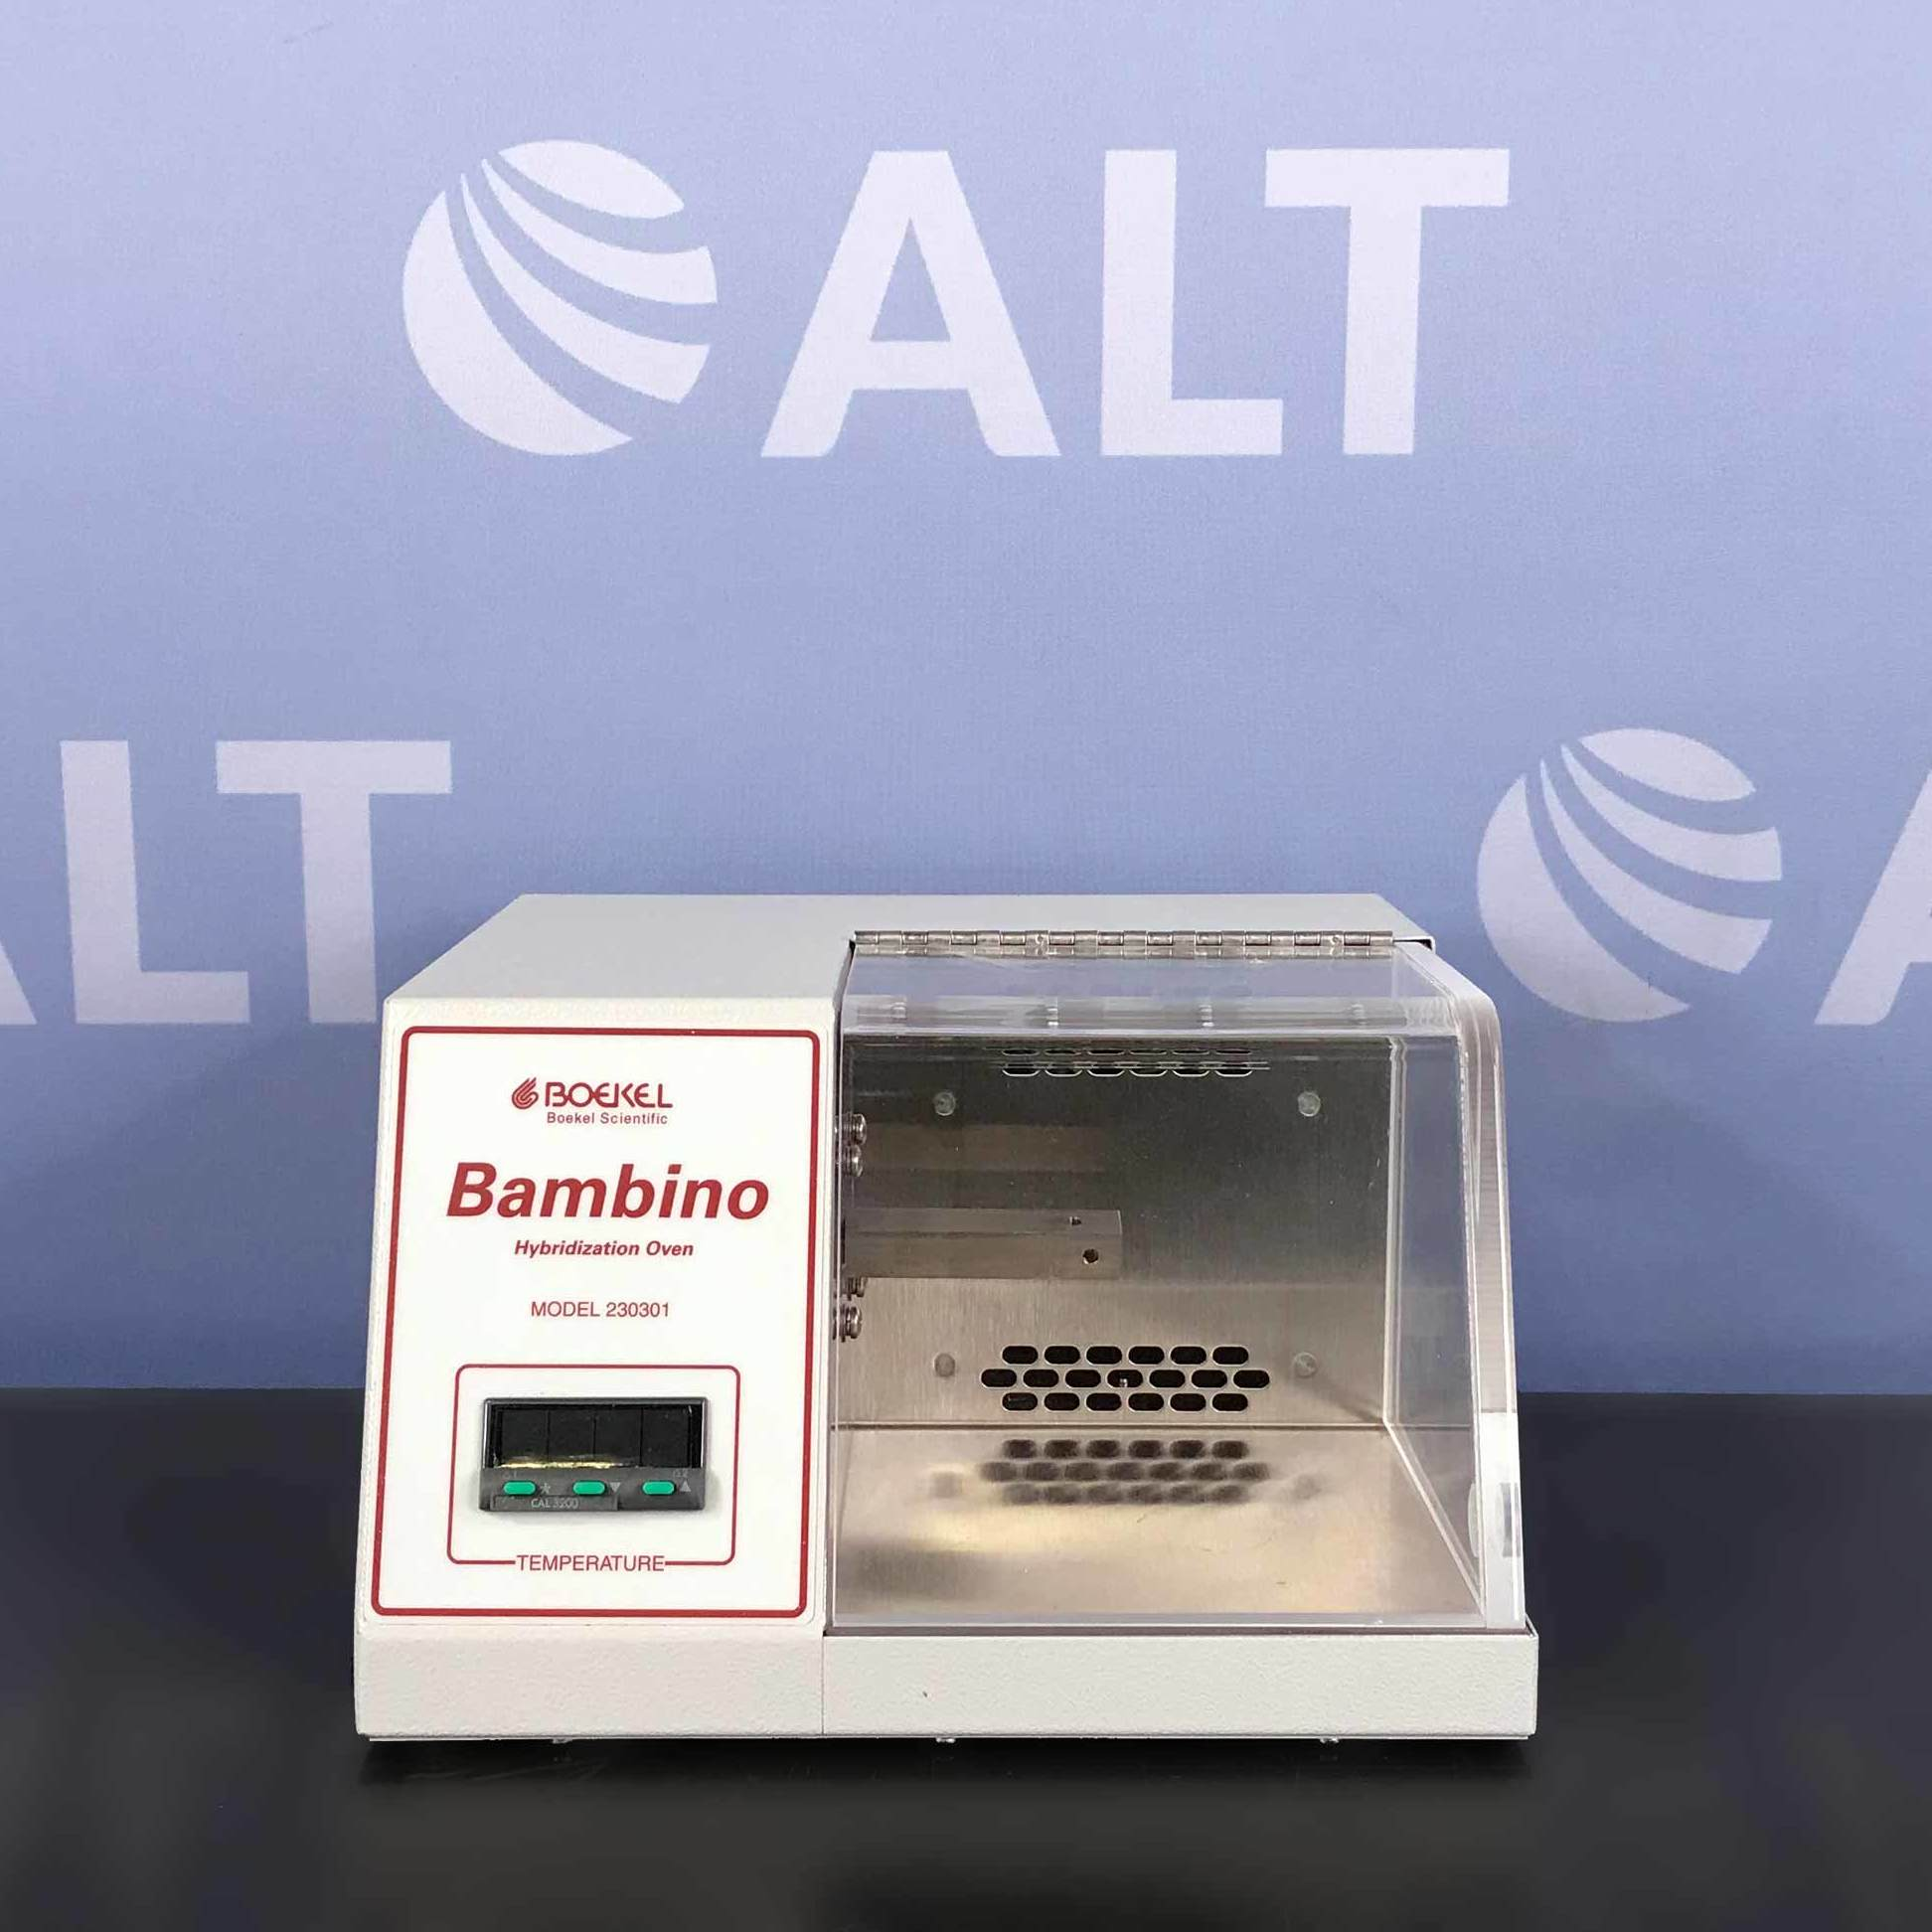 Bambino Hybridization Oven Model 230301 Name